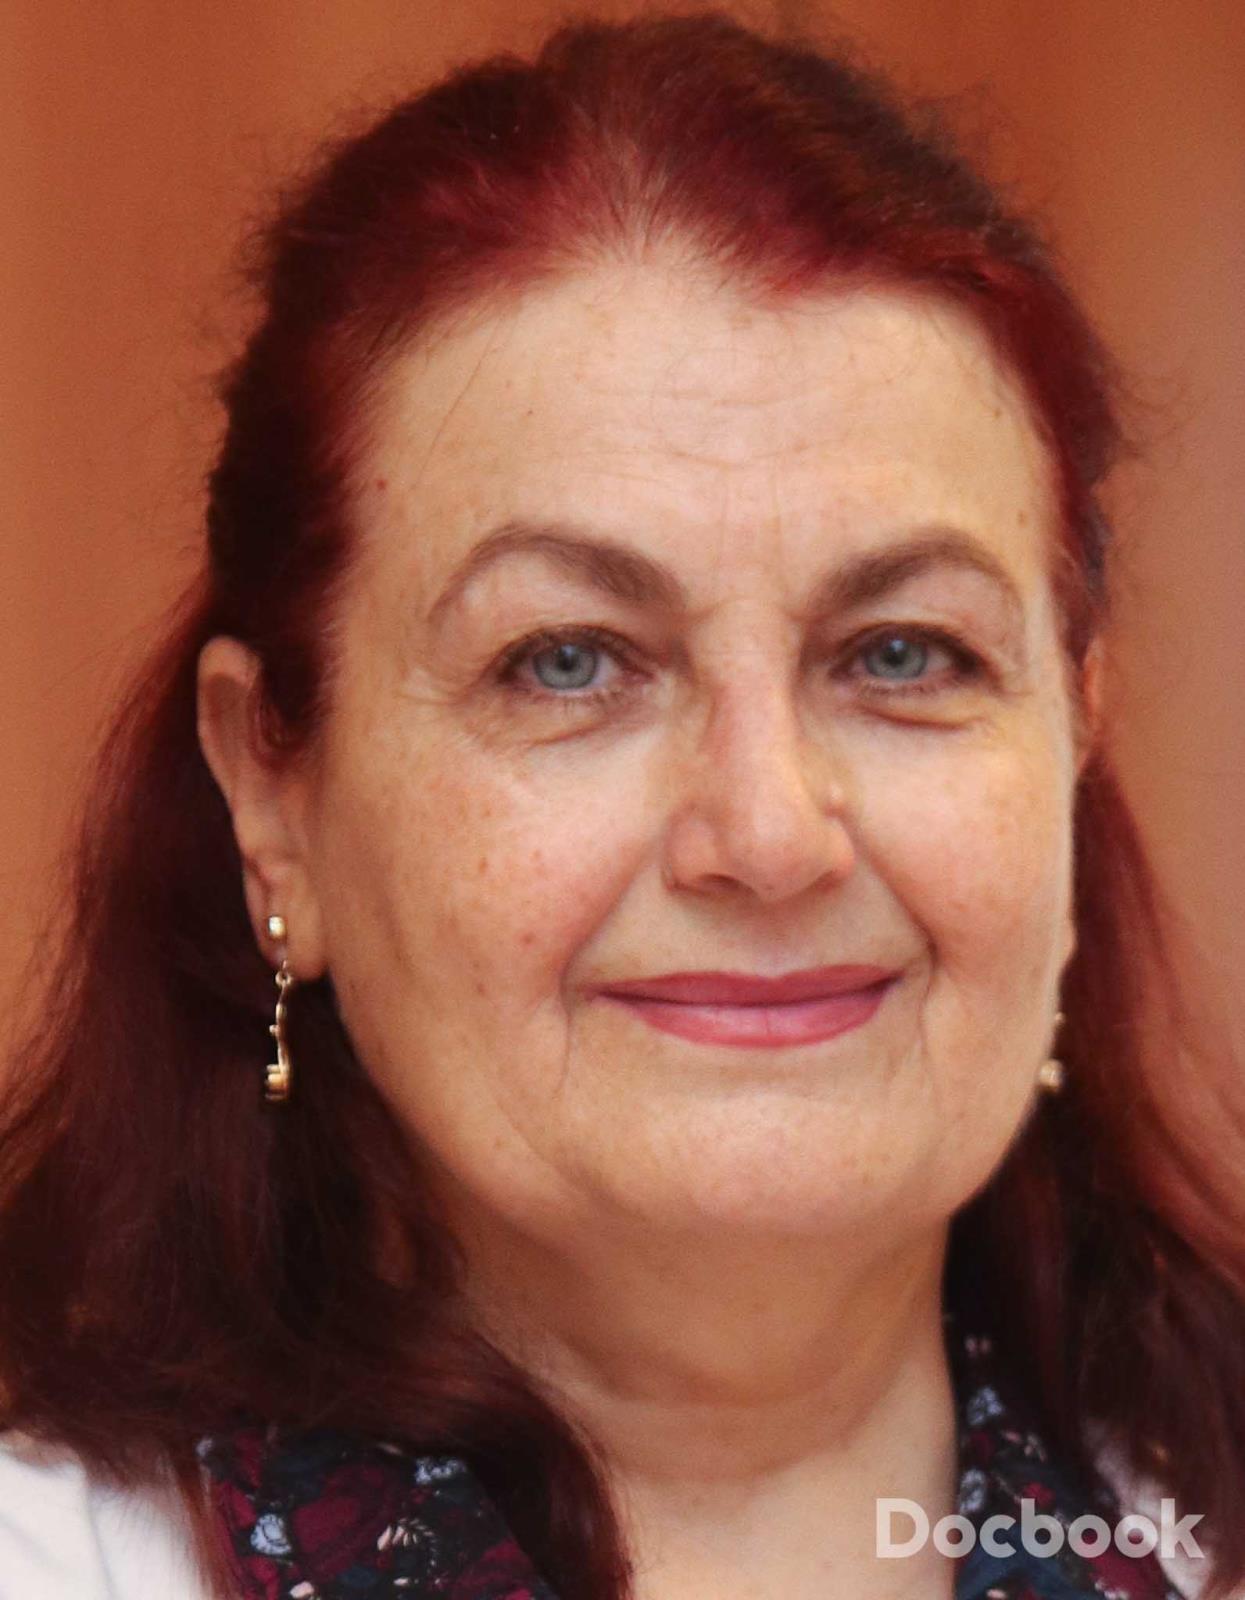 Dr. Adriana Jicman